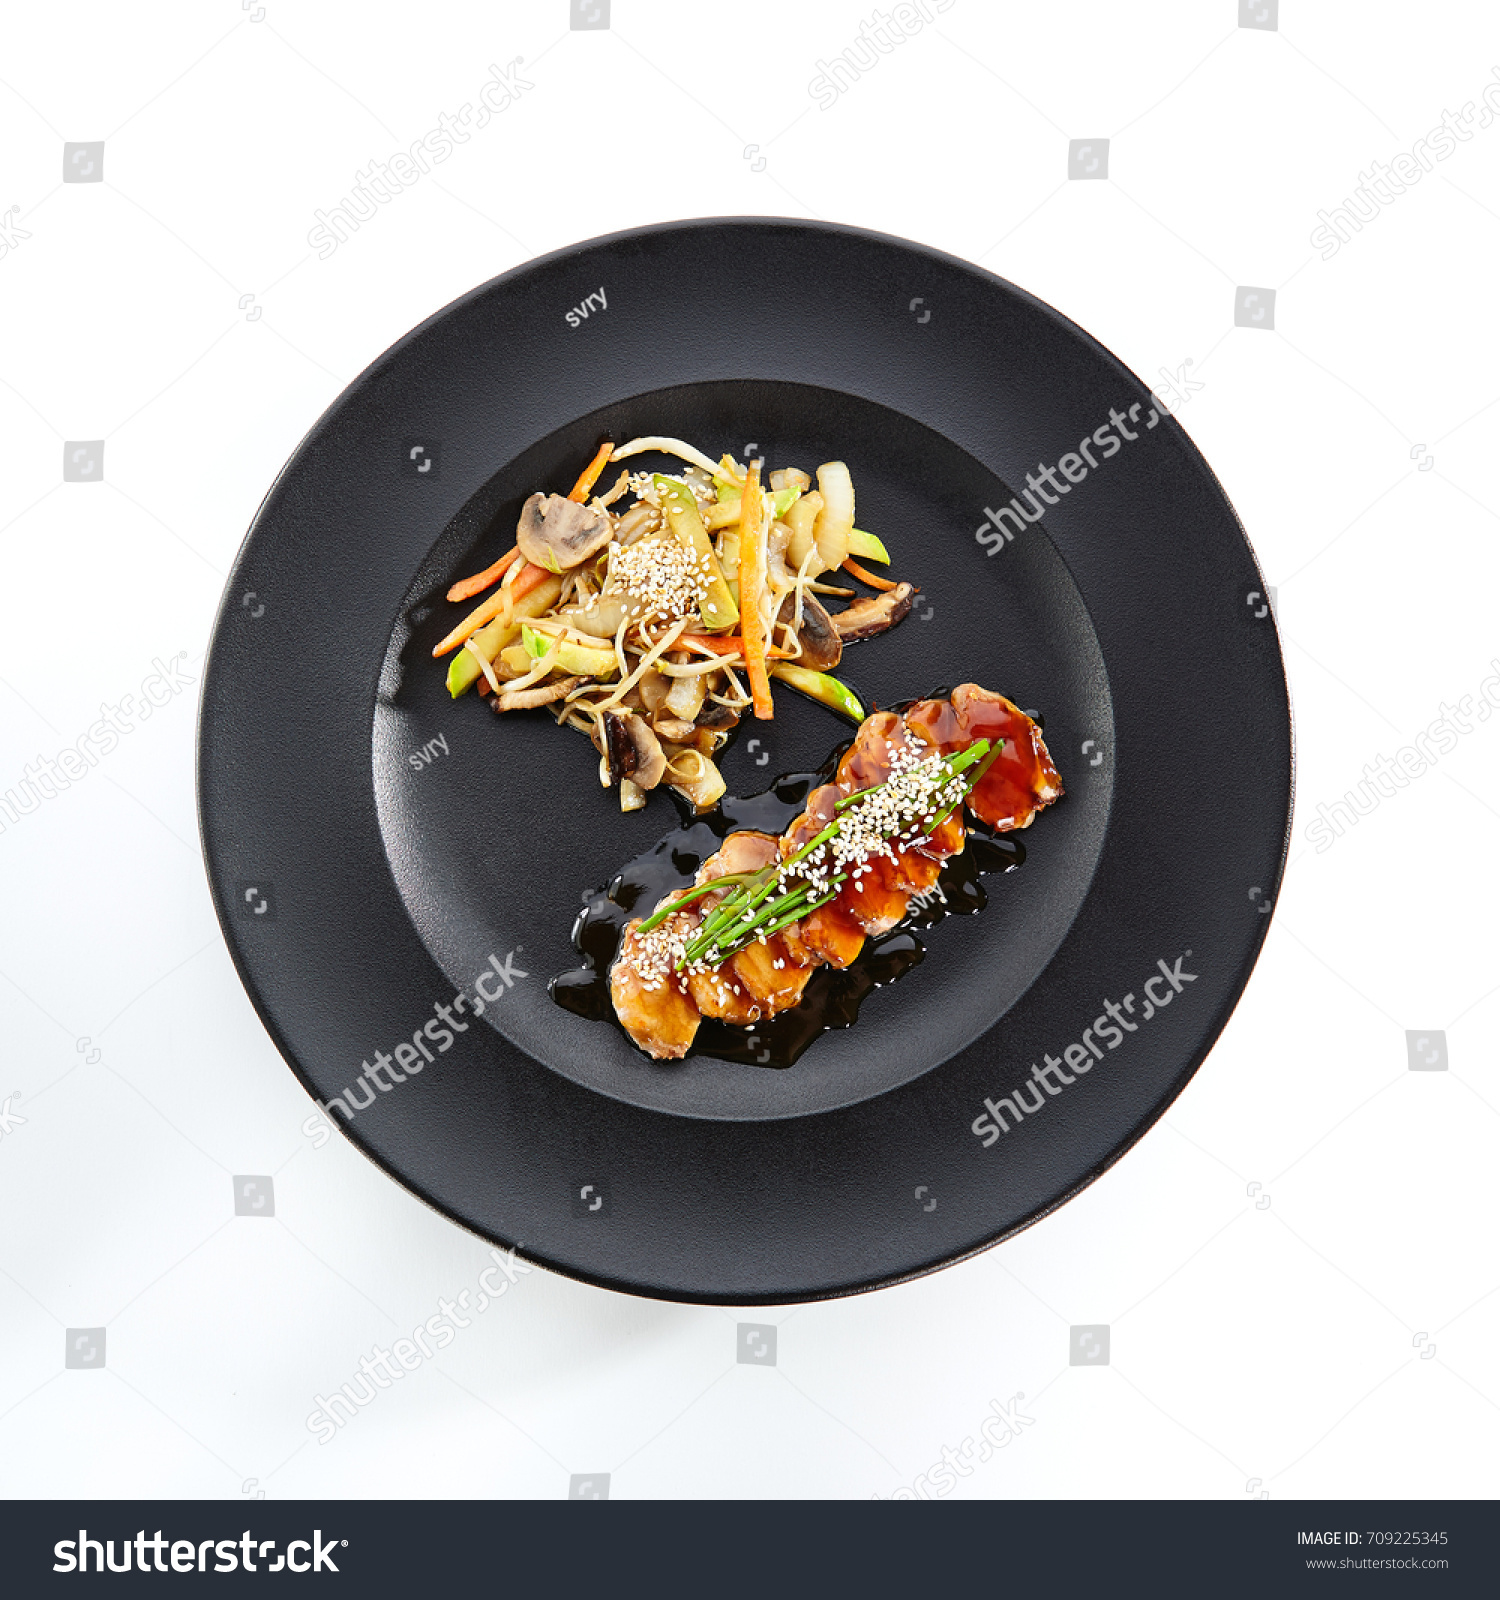 Teppan Grillplatte Trendy Teppanyaki Japanese And Korean Grill